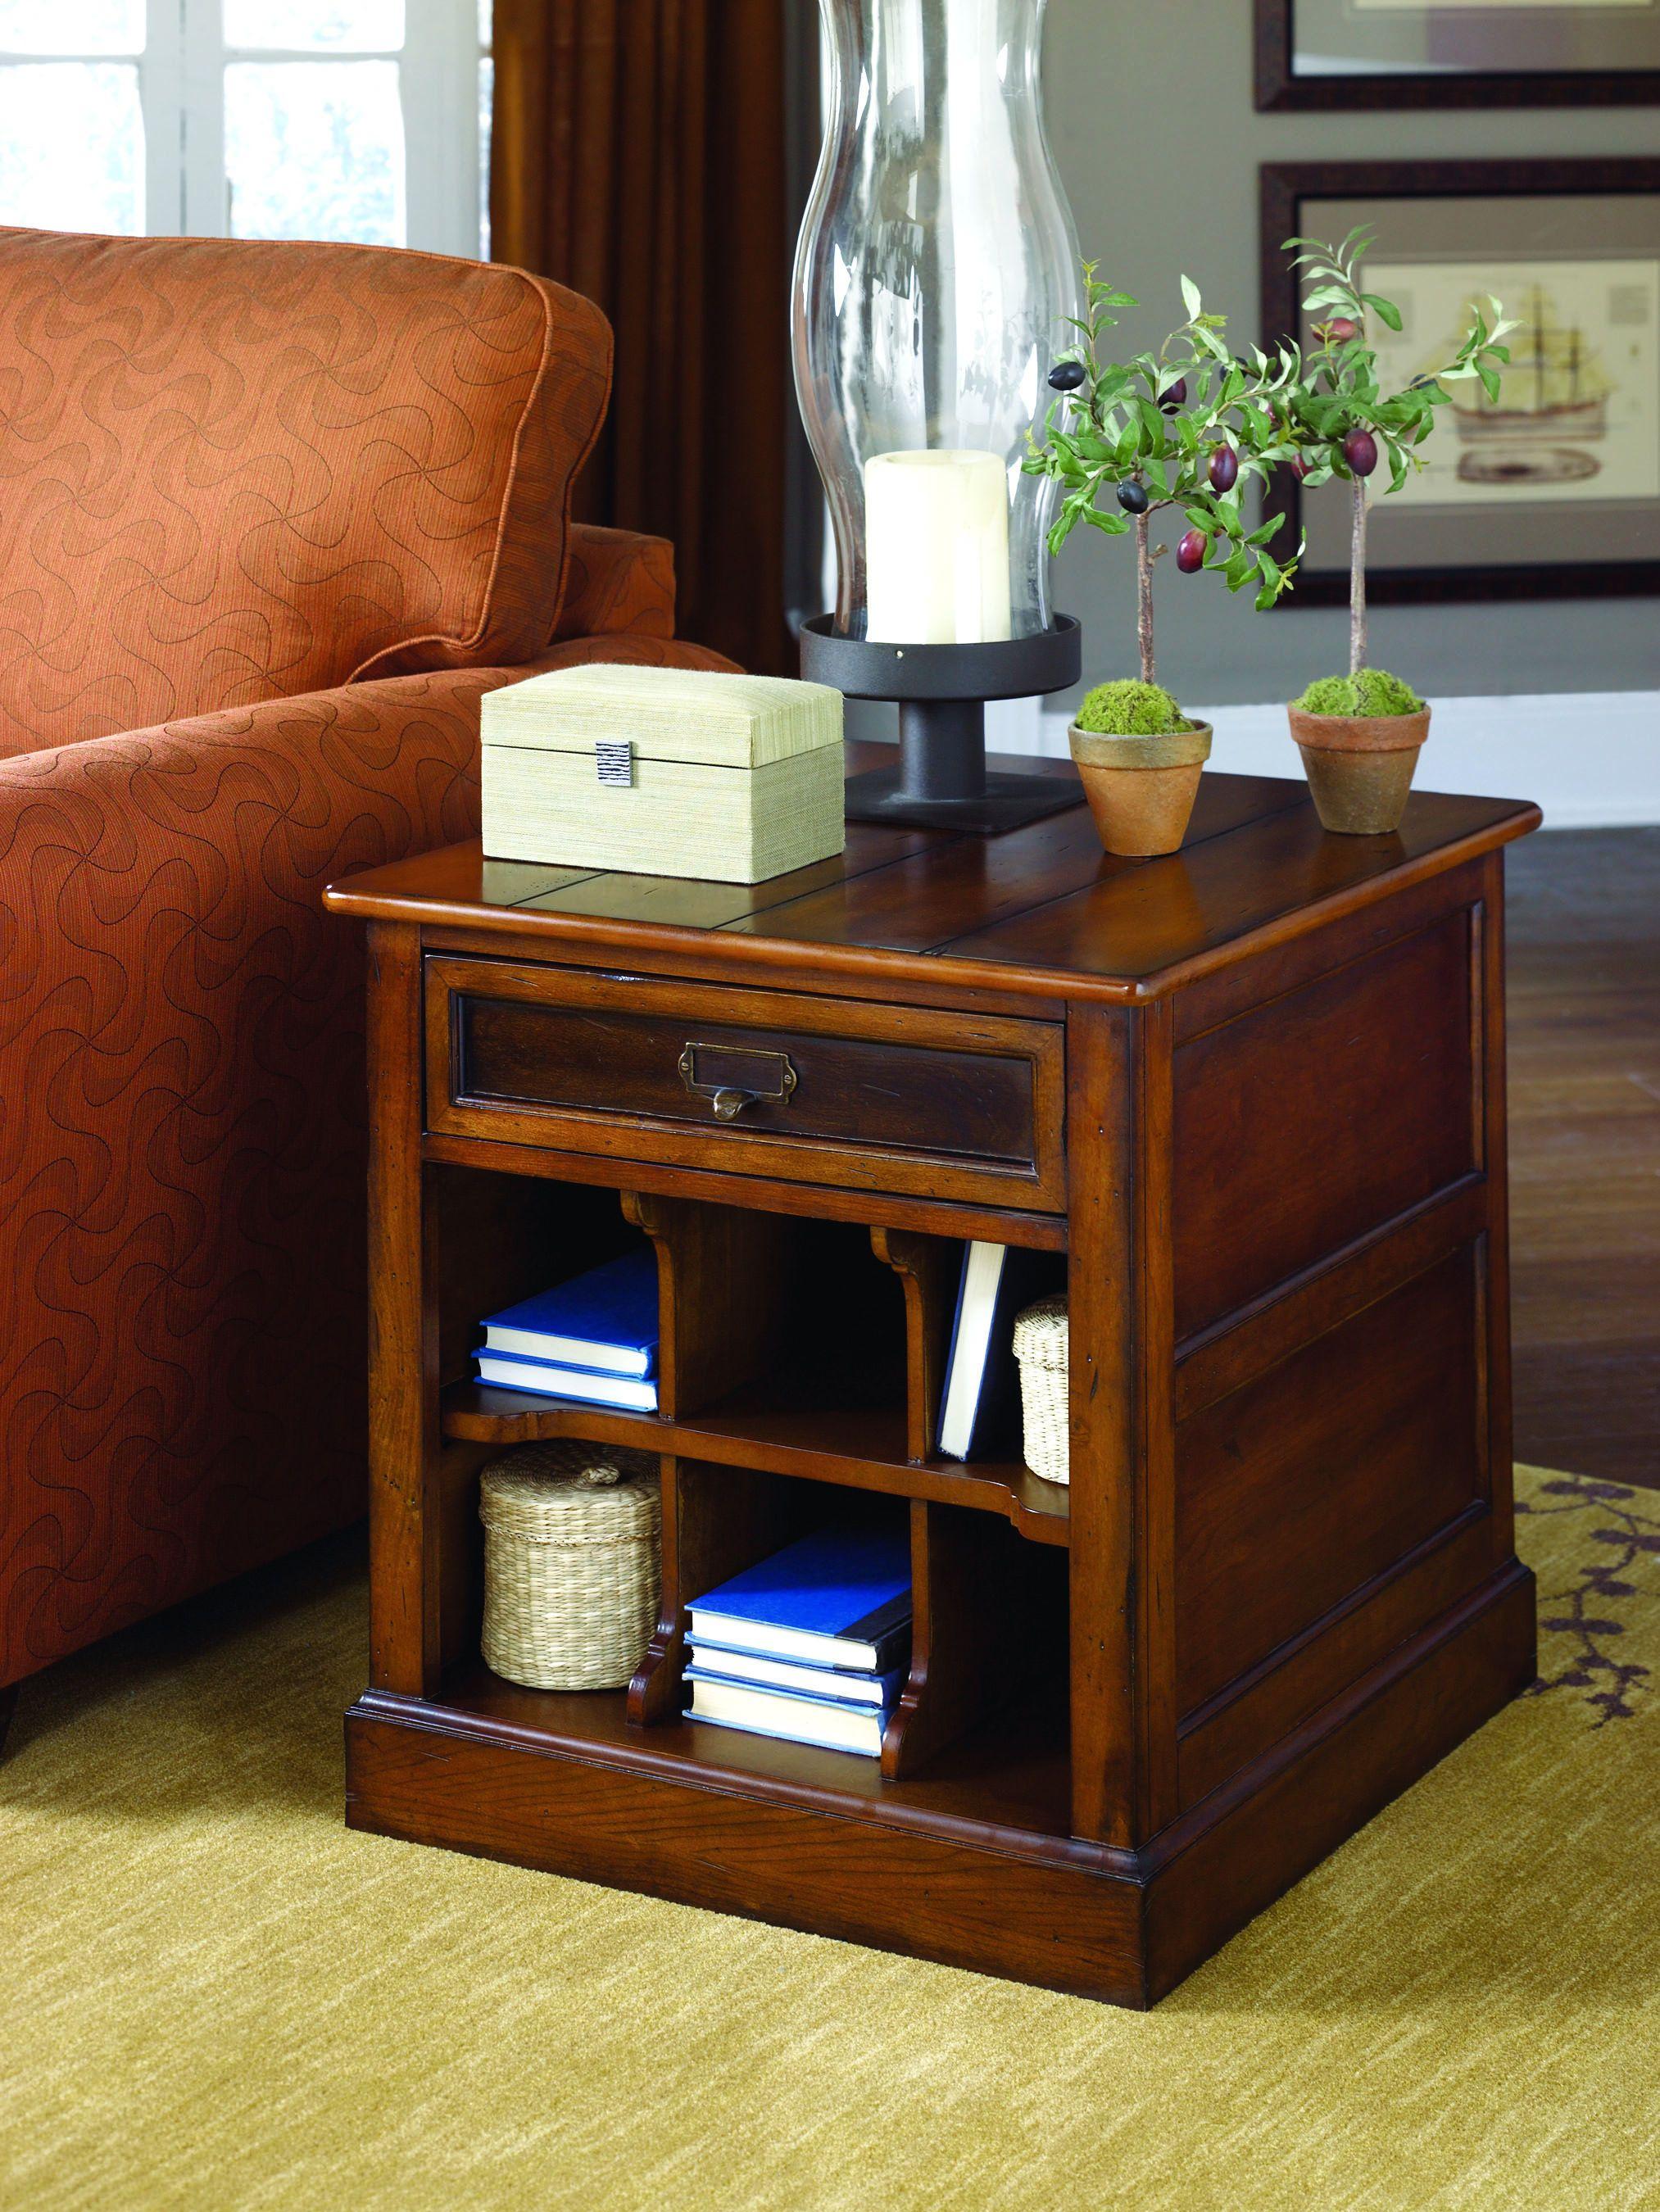 Rectangular Storage End Table -Kd 050-916 | Living room ...